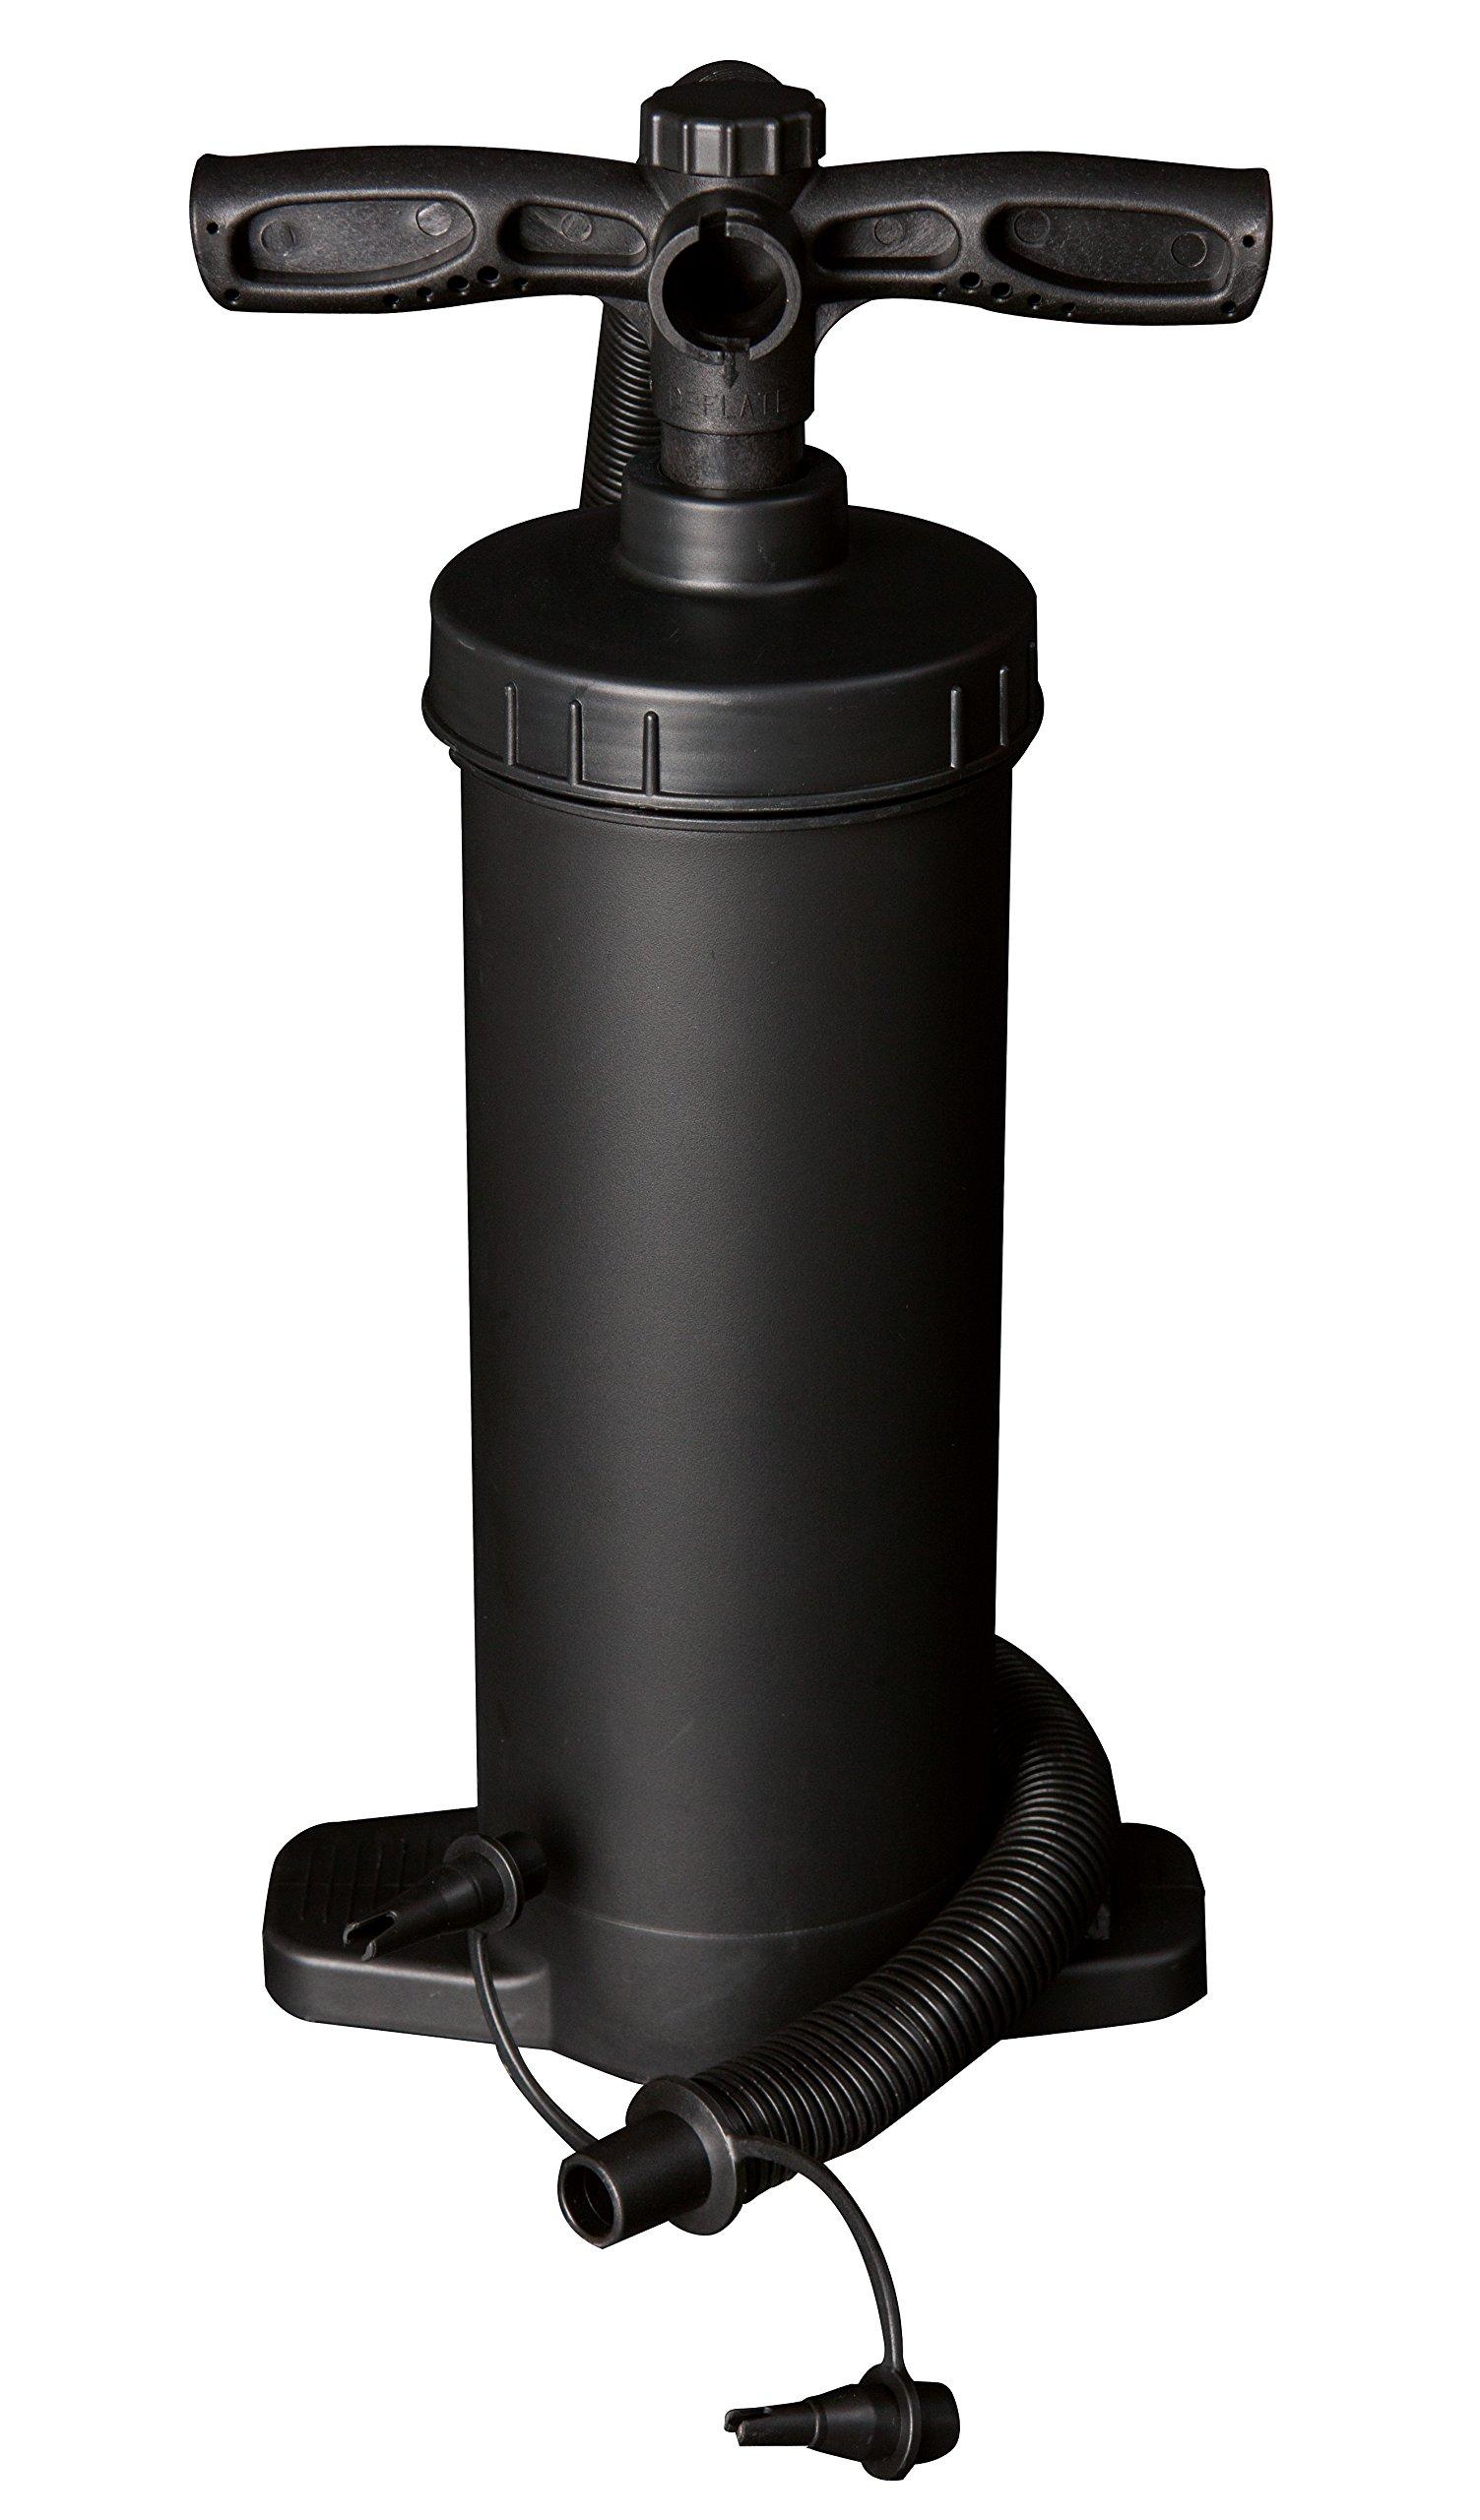 "Bestway 12"" Hammer Inflation Air Pump-Black, 12 Inch 4"